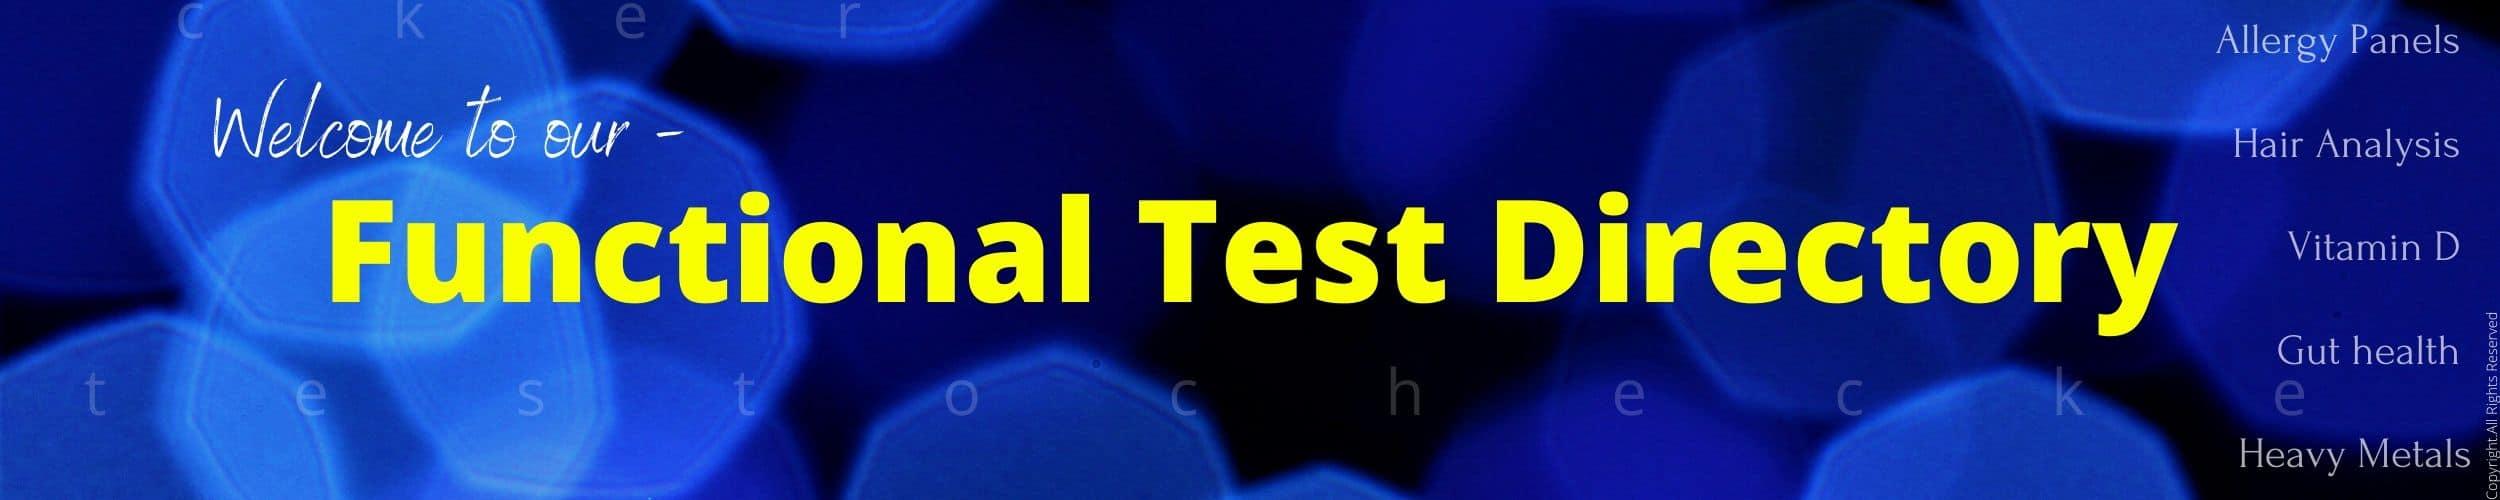 testochecker functional test directory banner